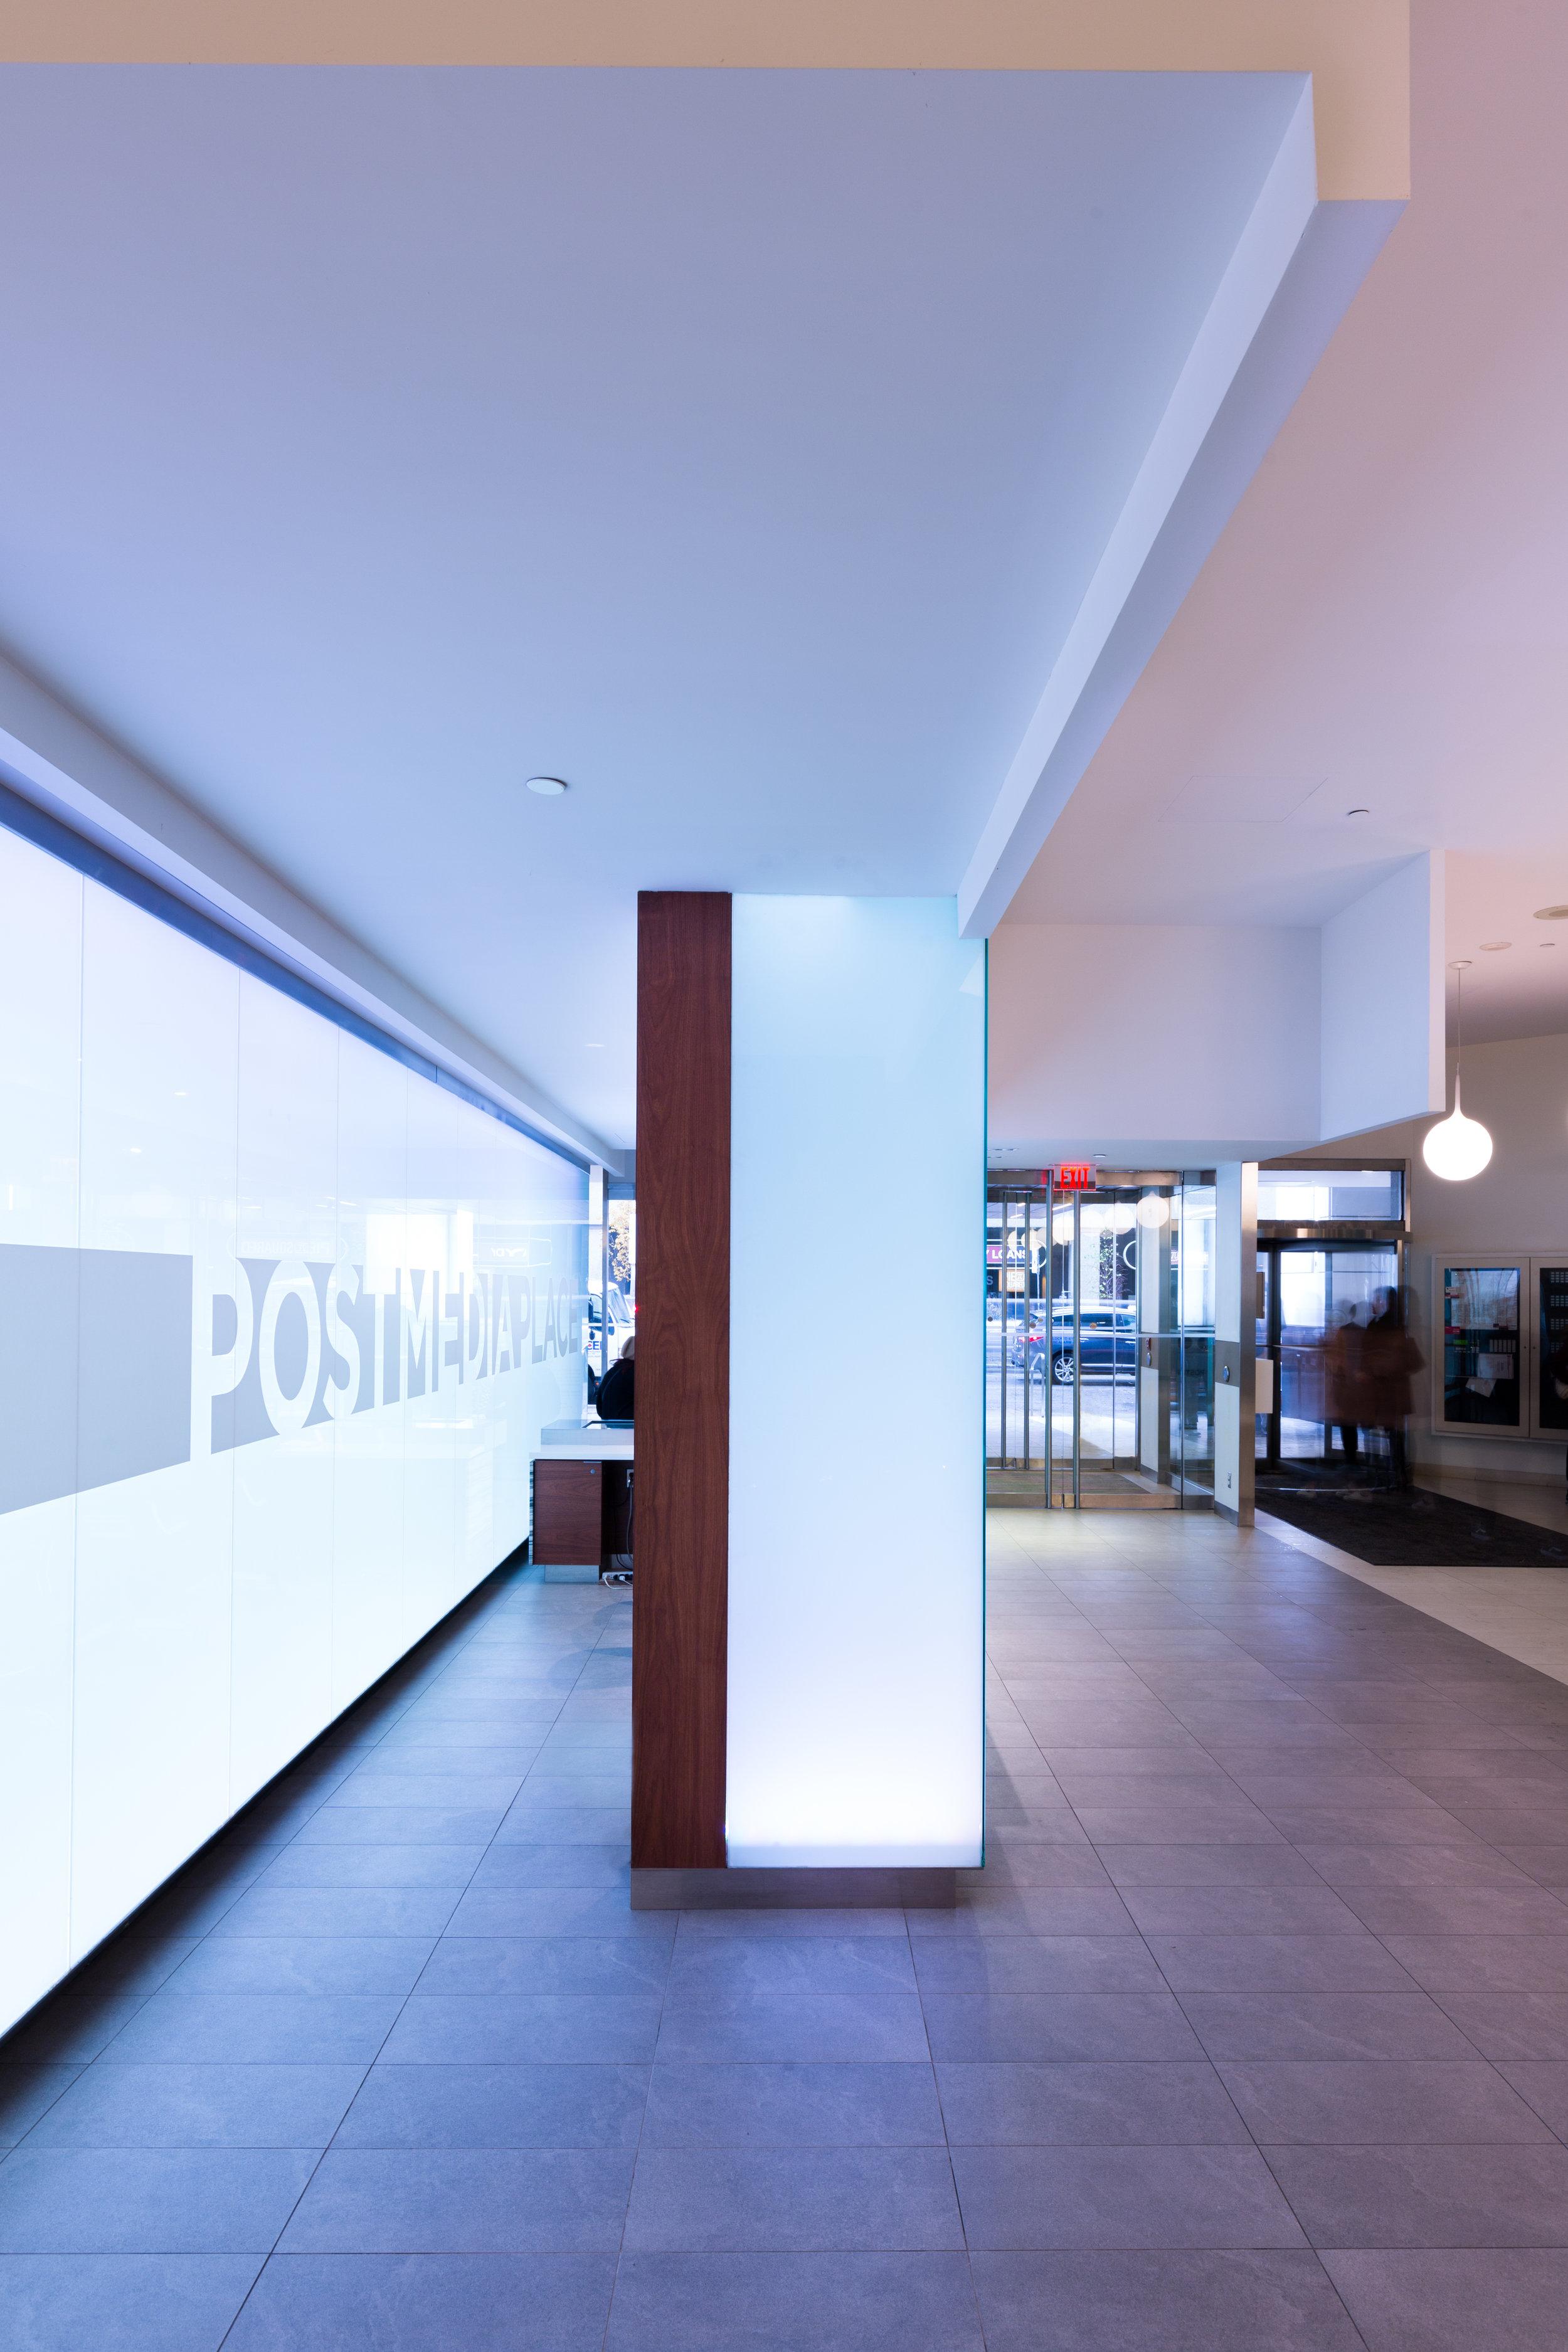 Postmedia Lobby